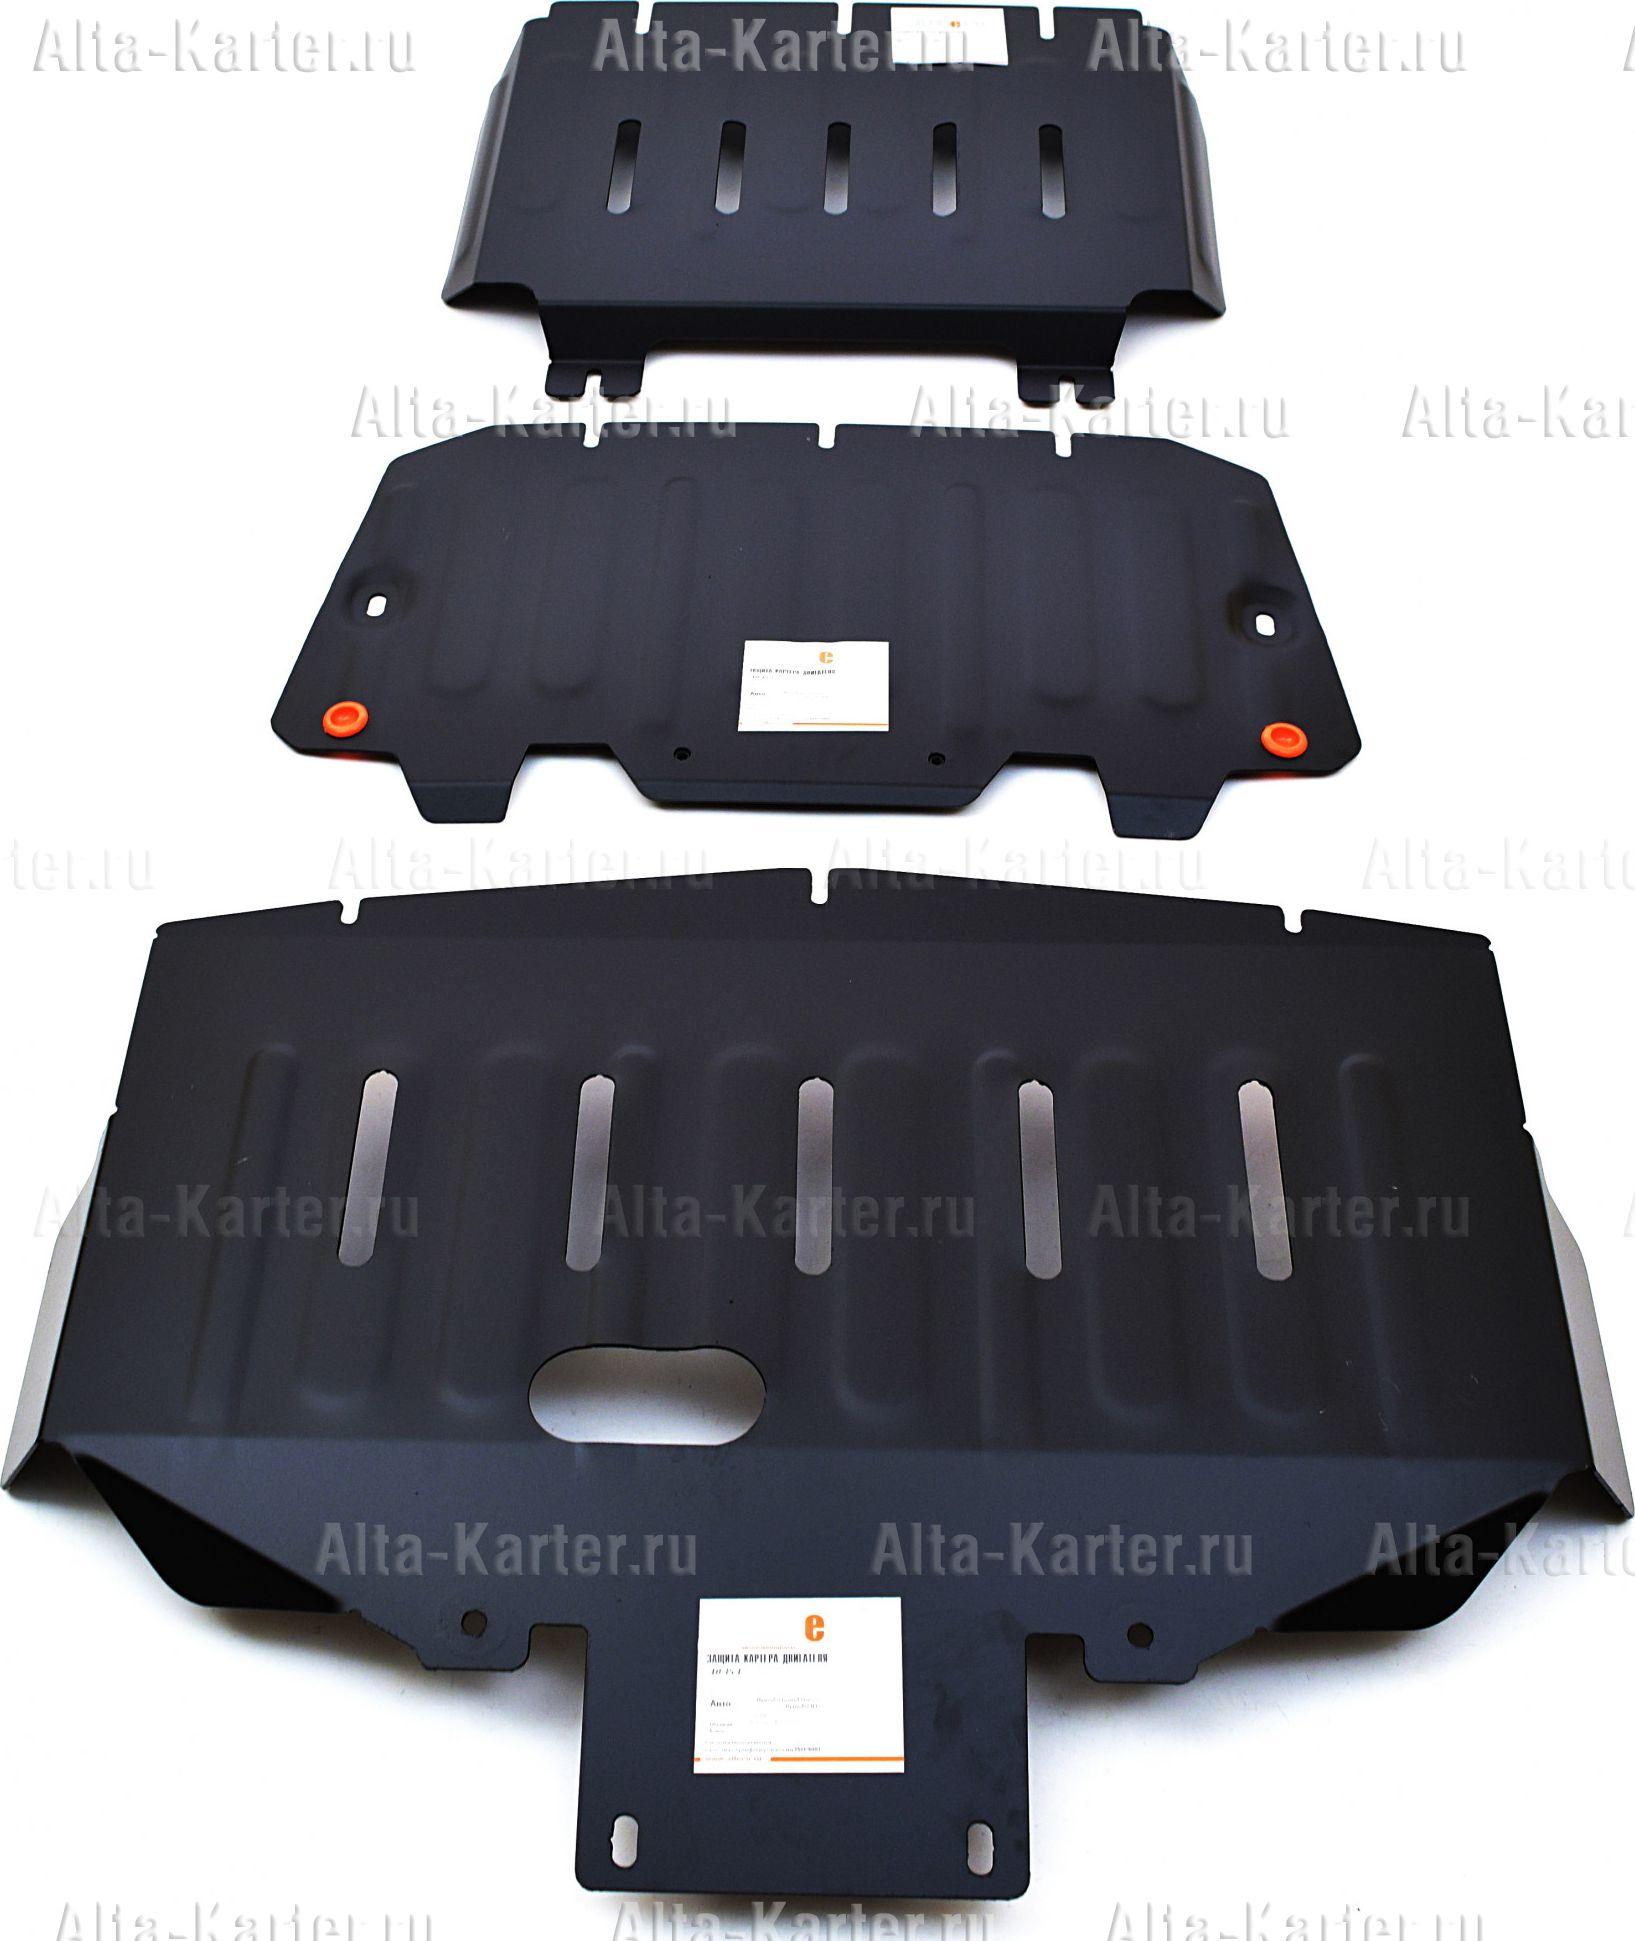 Защита Alfeco для картера и КПП Hyundai Starex H1 RWD 2007-2021. Артикул ALF.10.35